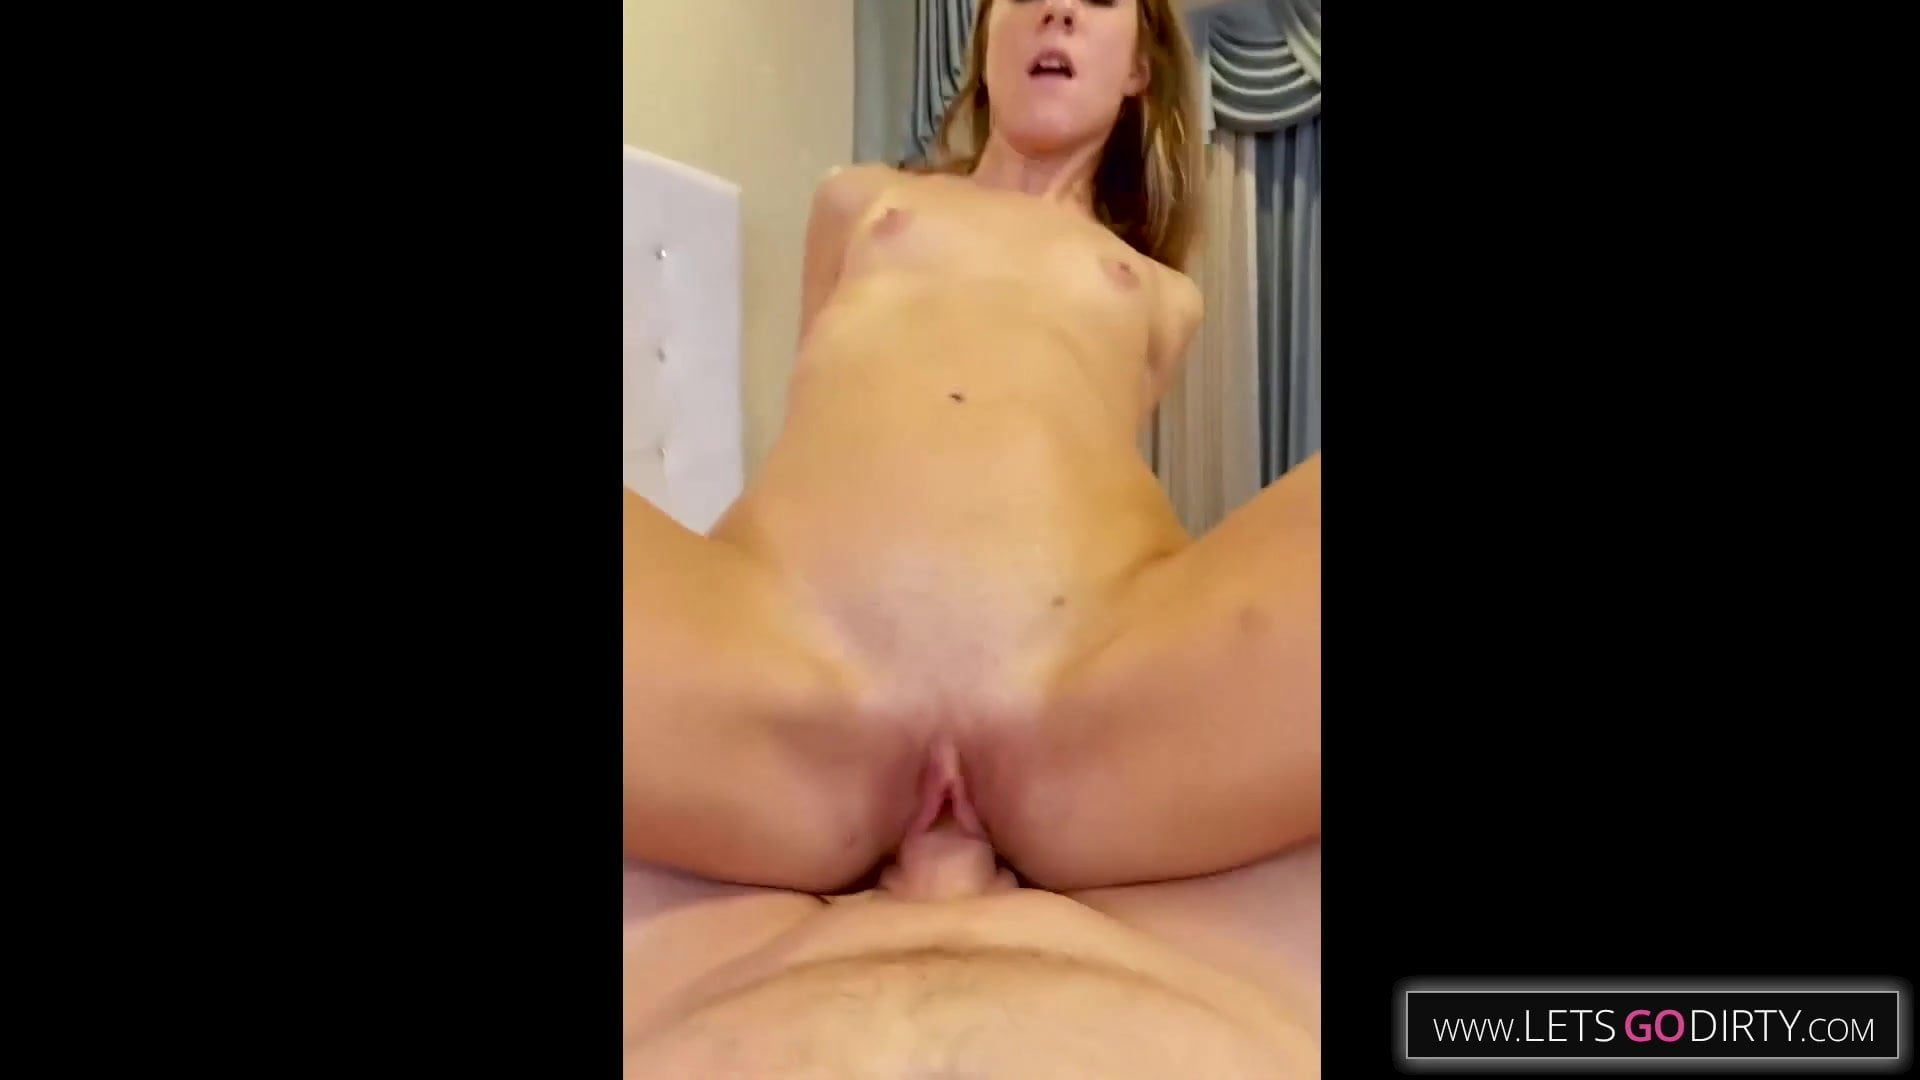 very wet pussy sex